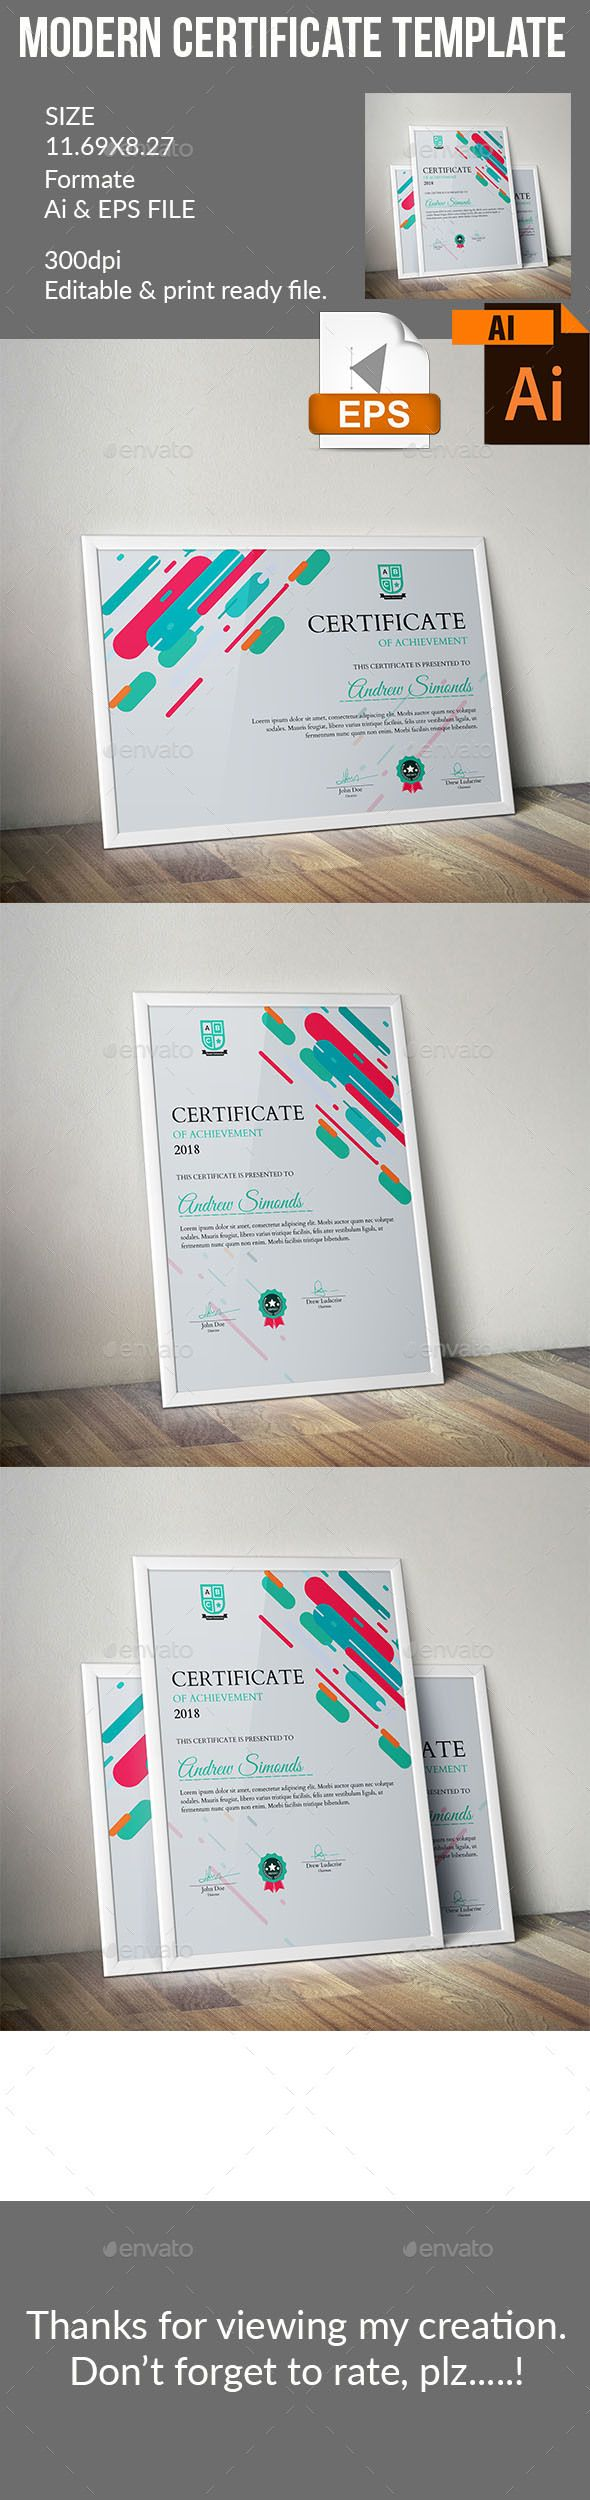 1454 best modern certificate design images on pinterest certificate certificate designcertificate templatesaward certificatesadobe yelopaper Choice Image